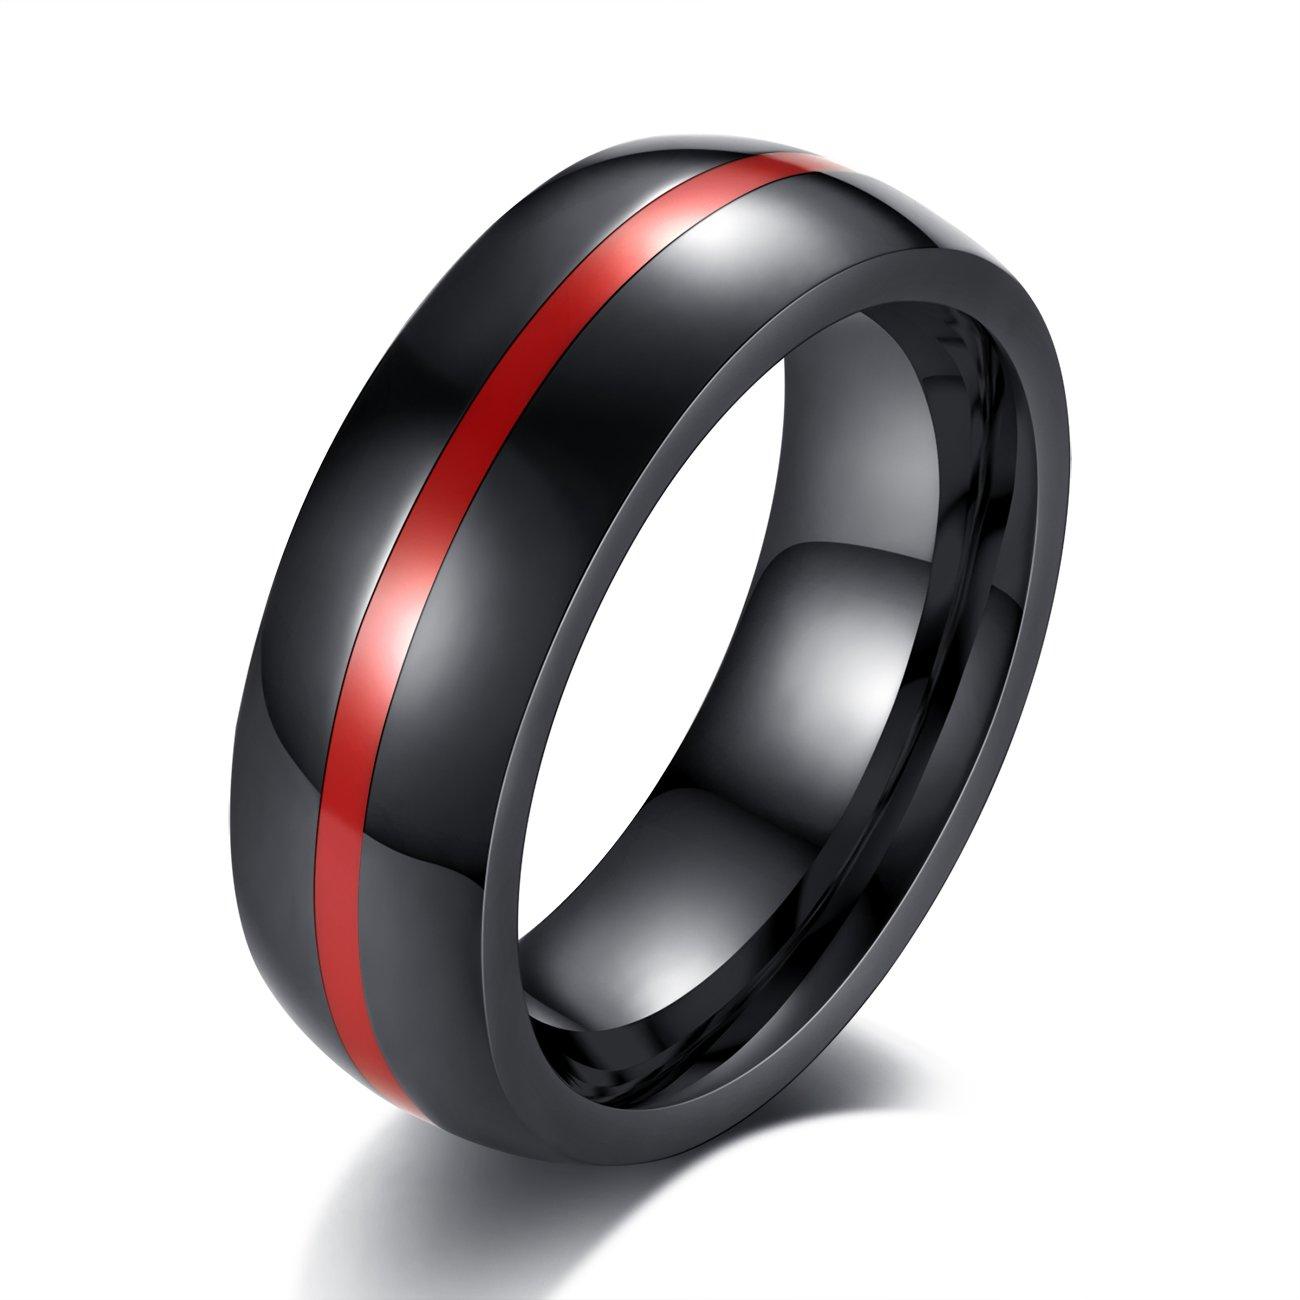 Revemcn 8mm Black Stainless Steel Thin Line Polished Finish Wedding Band Ring For Men Women 4 Coloramazon: Gunmetal Thin Wedding Band At Reisefeber.org